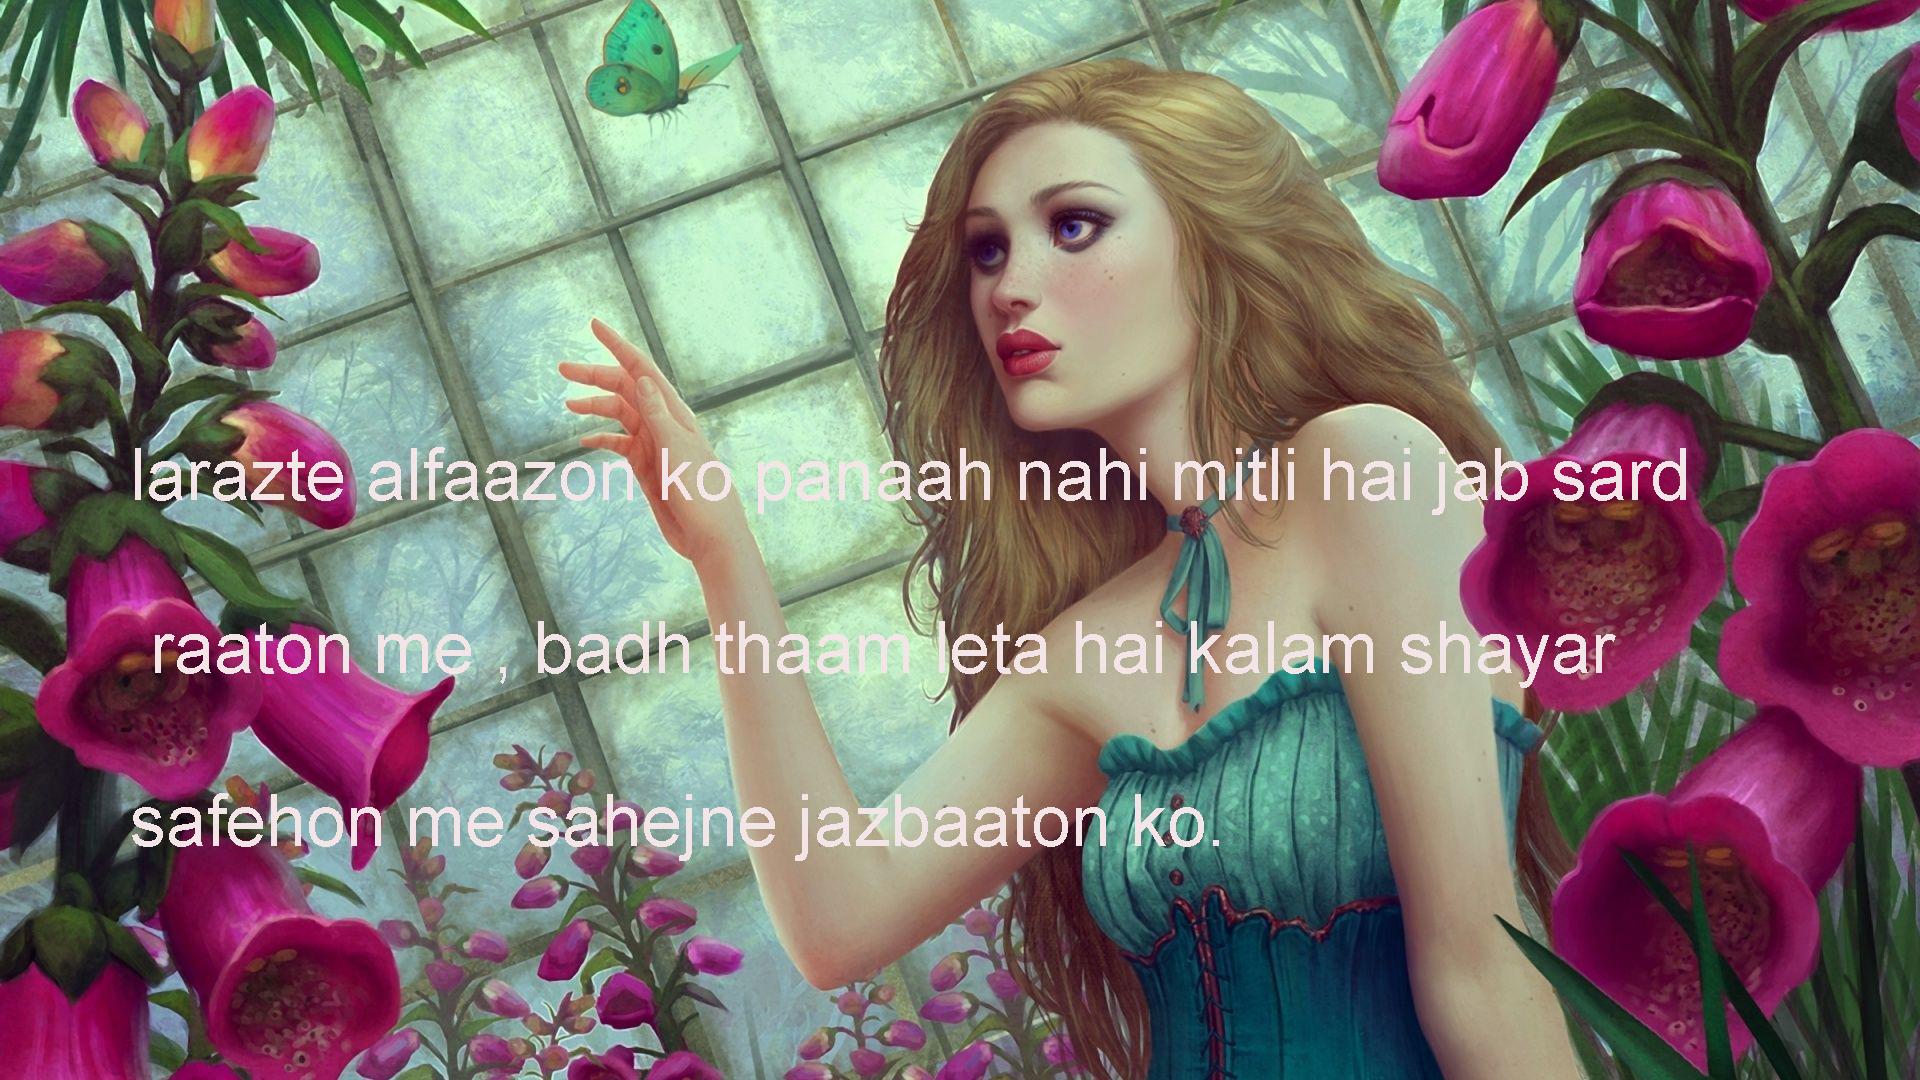 #famous shayar ki shayari in hindi,